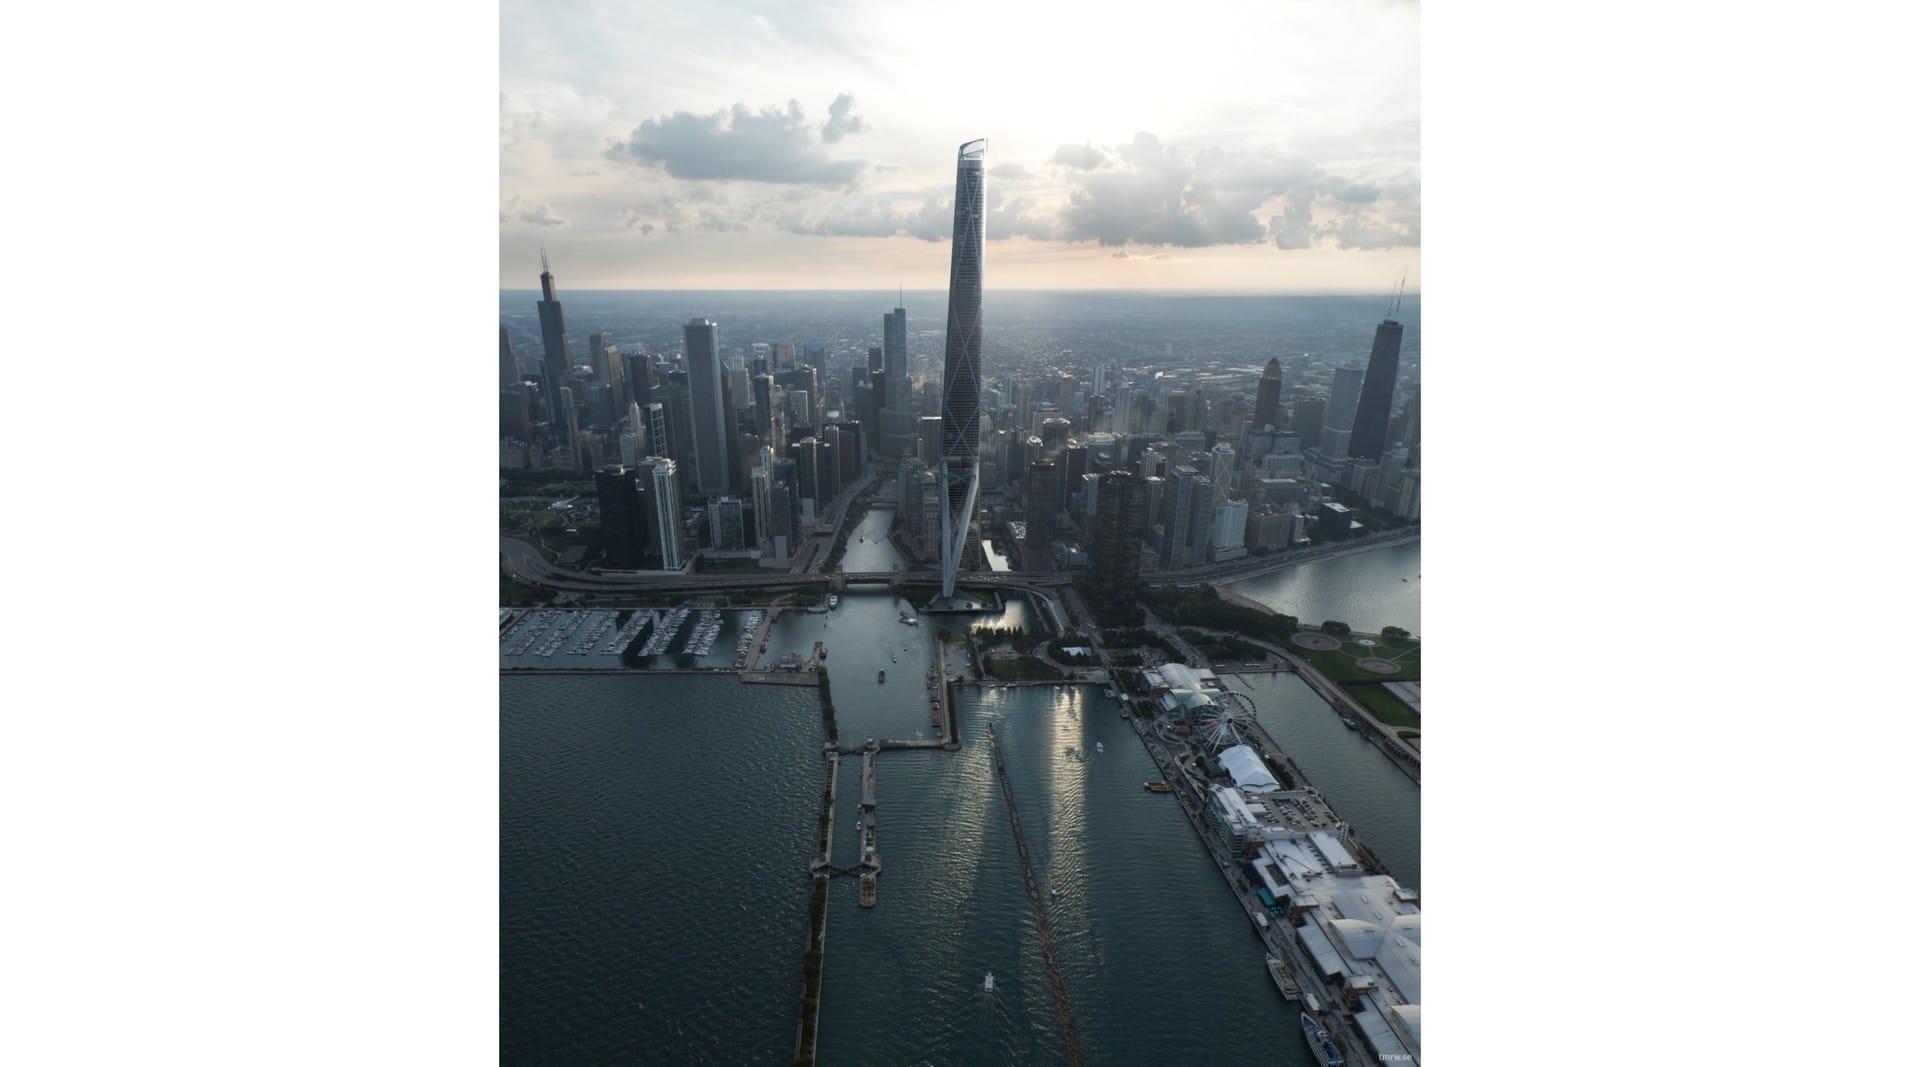 Tomorrow Gensler Gateway Tower